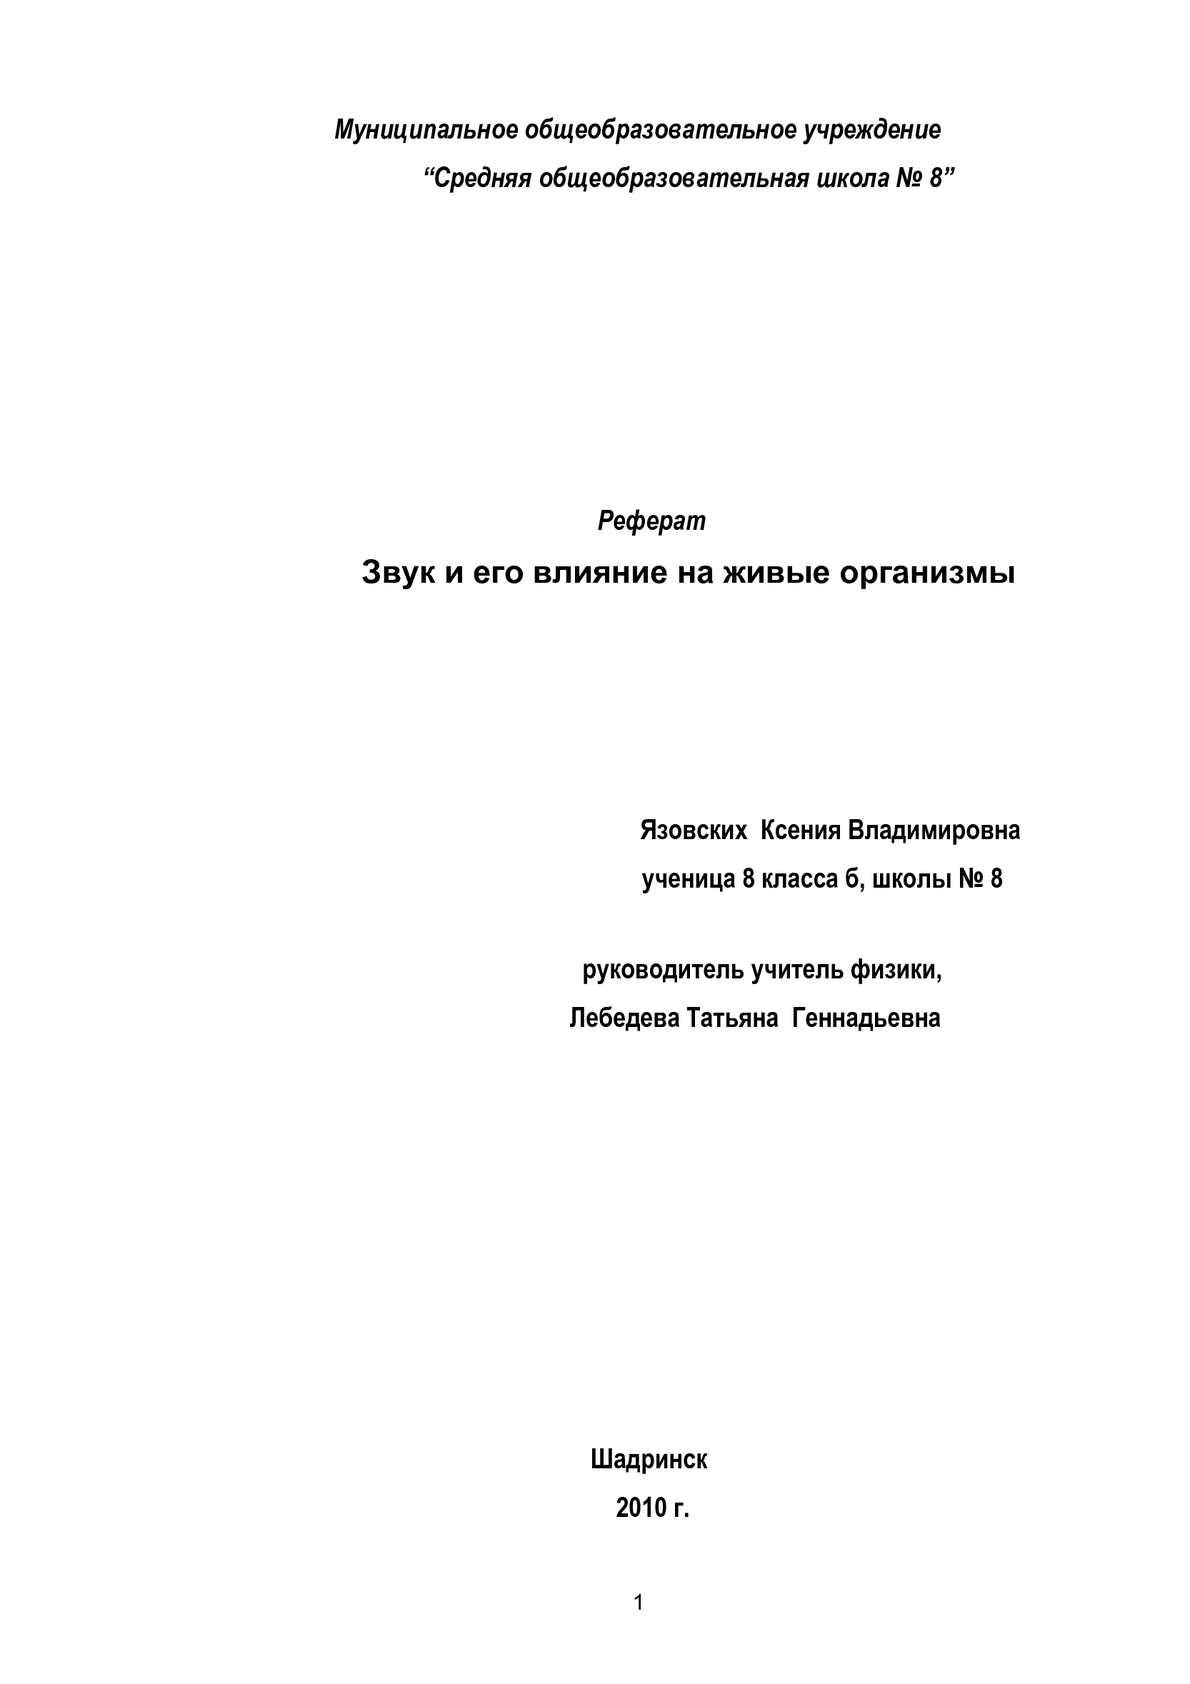 Реферат Звук и его влияние на человека calameo er page 1